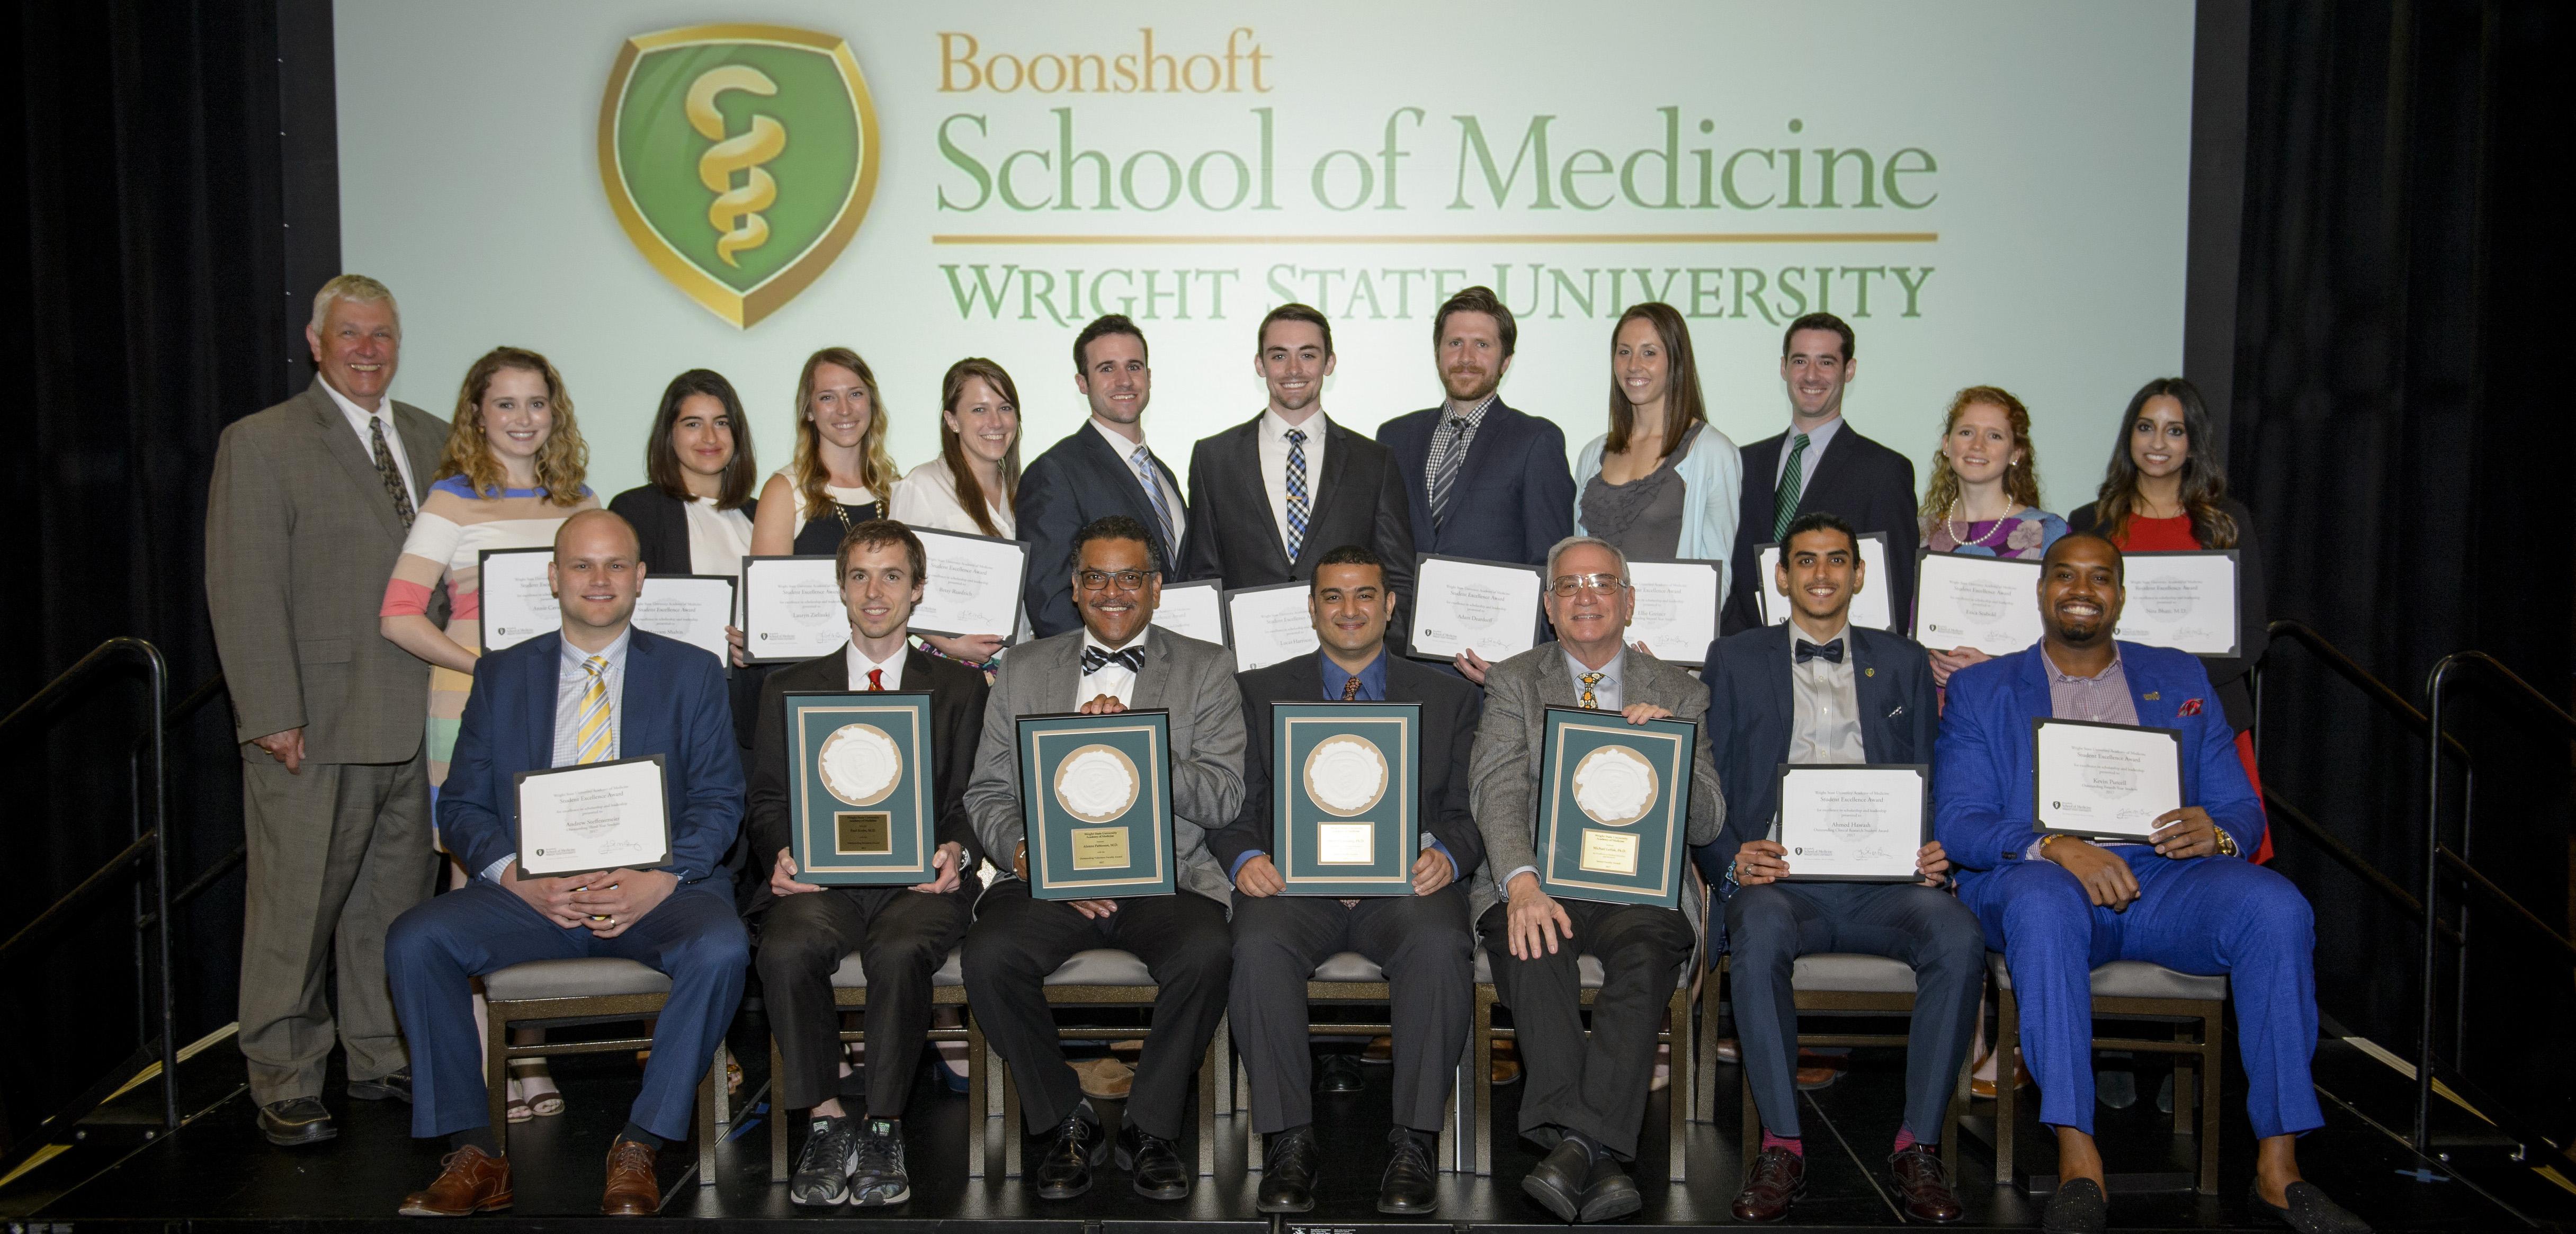 academy of medicine boonshoft